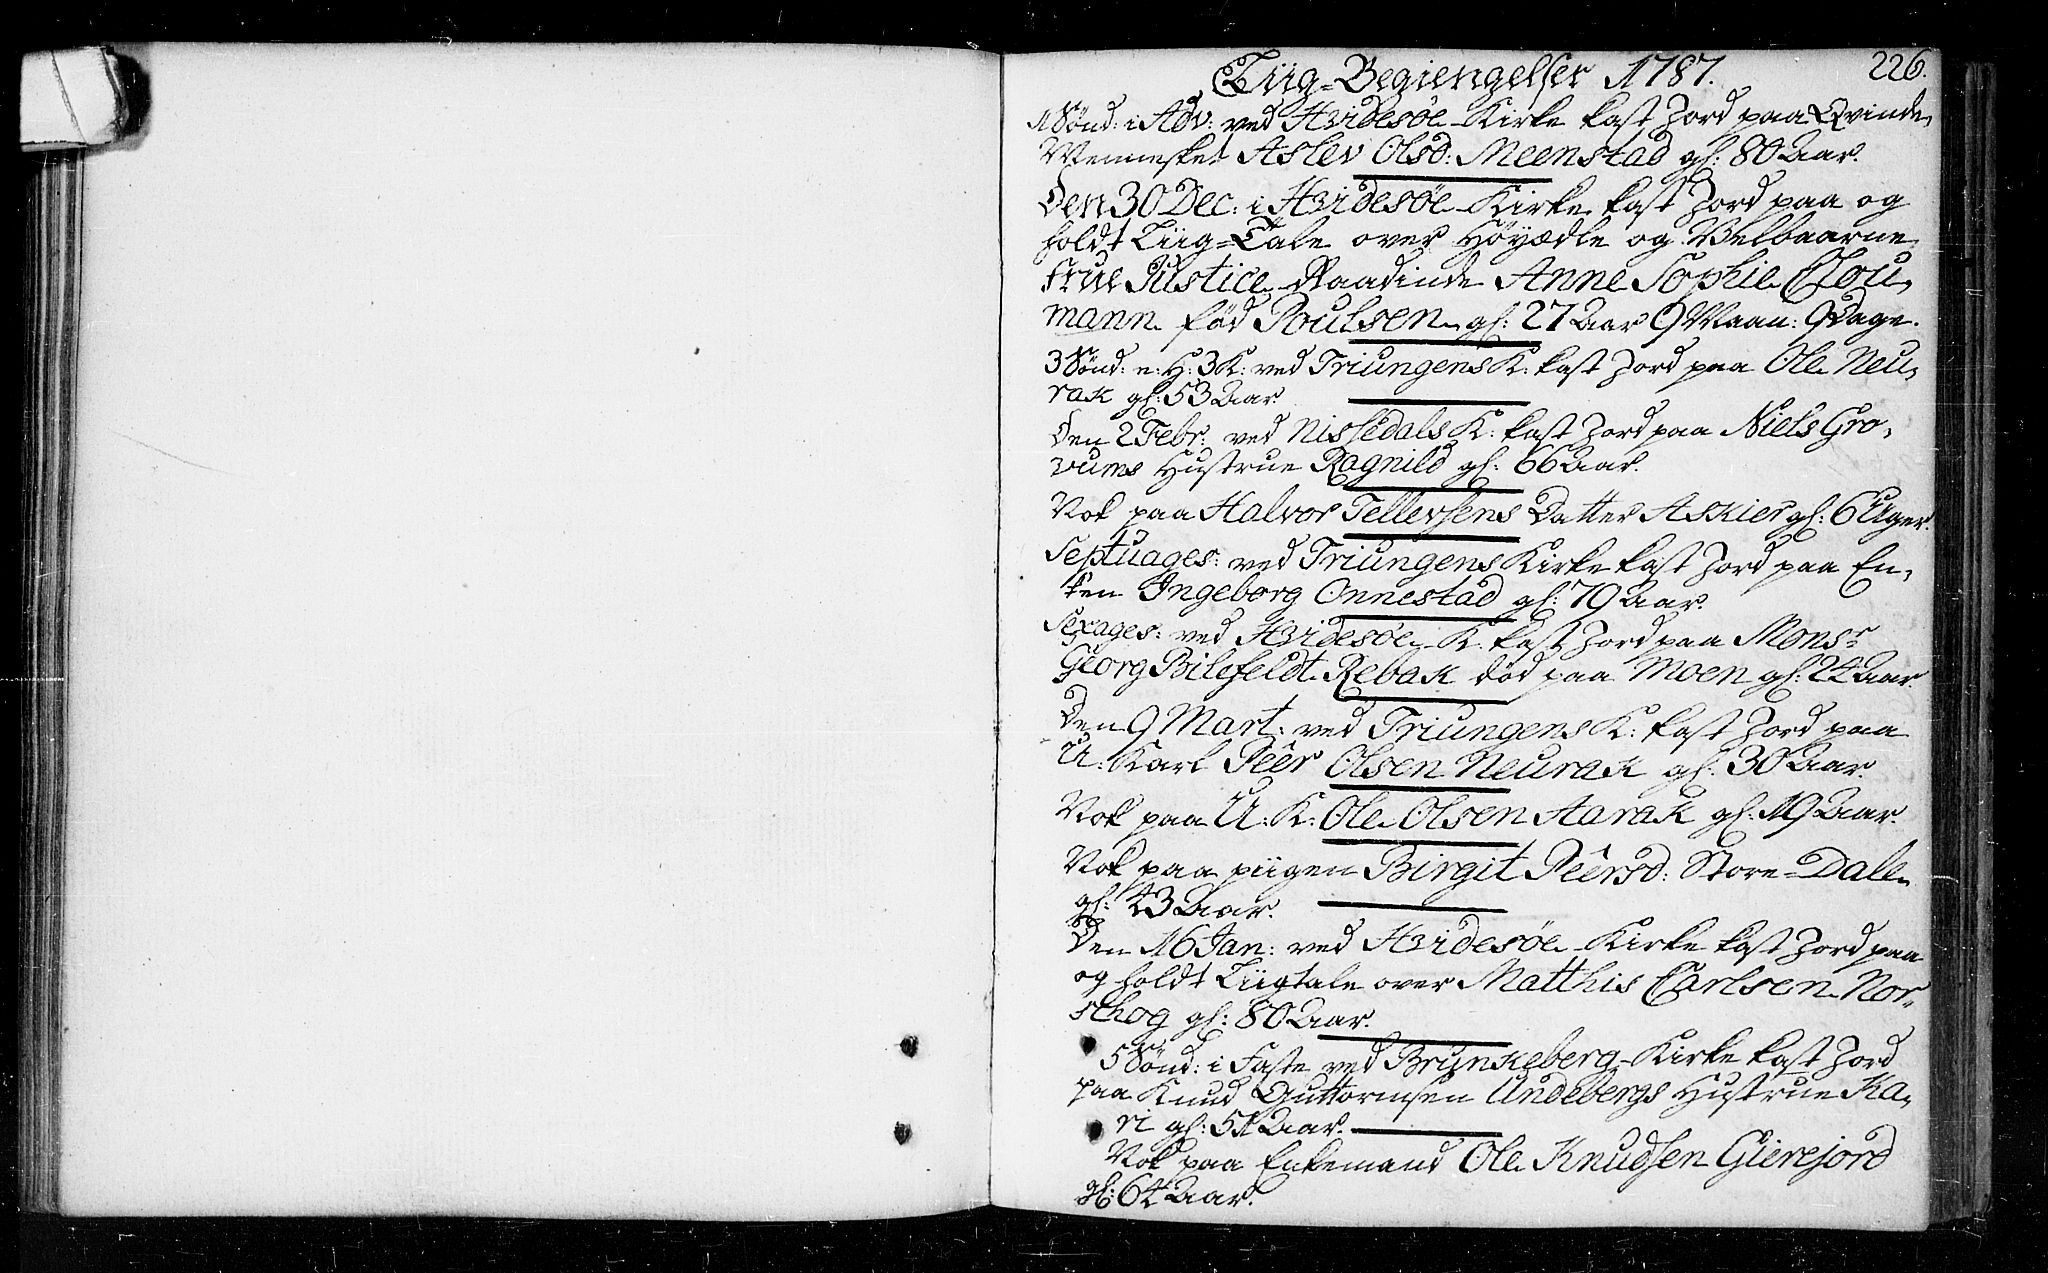 SAKO, Kviteseid kirkebøker, F/Fa/L0003: Parish register (official) no. I 3, 1787-1799, p. 226